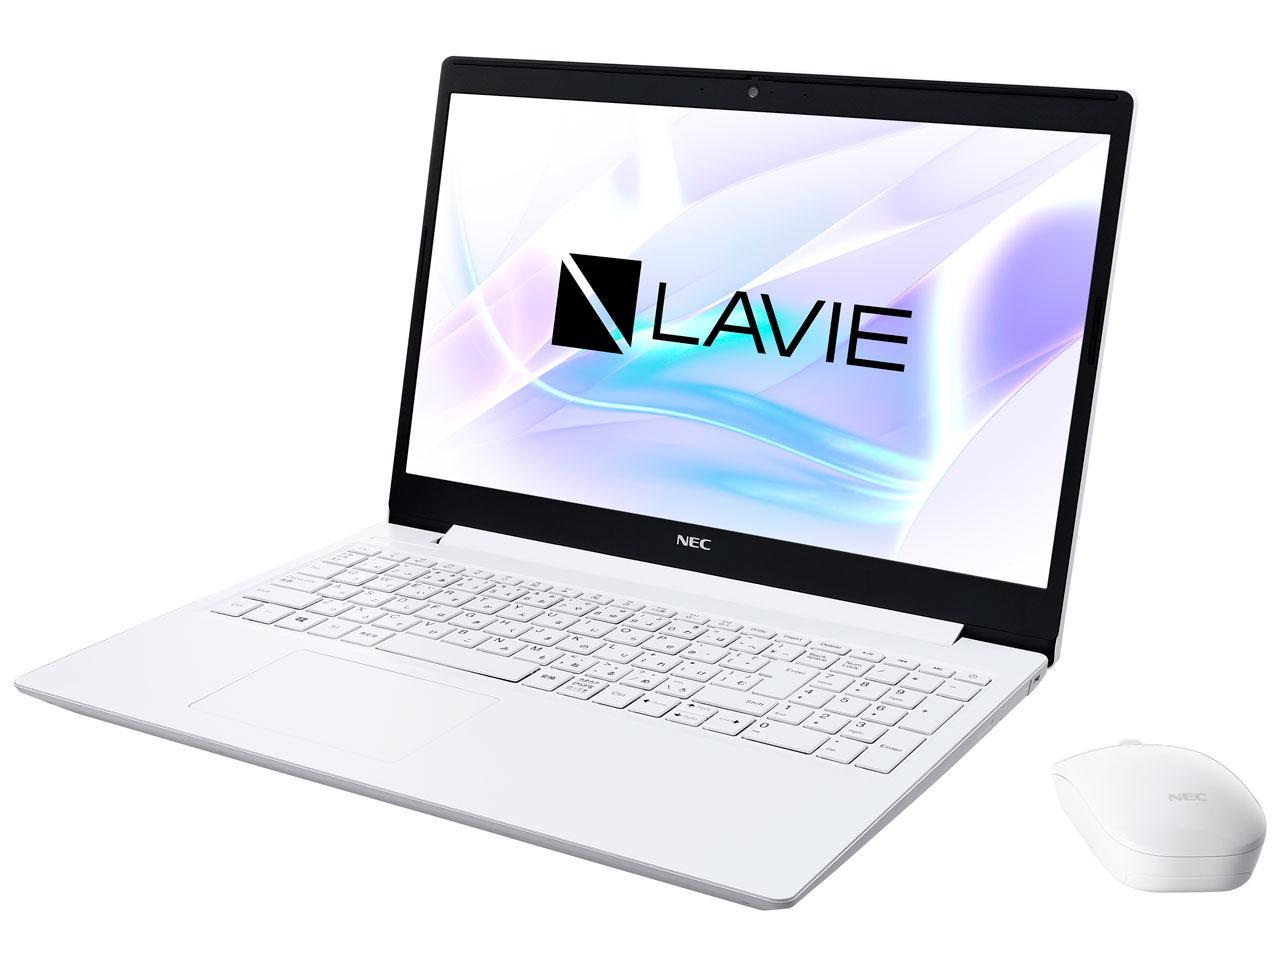 NEC PC-NS600RAW ノートパソコン LAVIE Note Standard カームホワイト(PC-NS600RAW)【smtb-s】